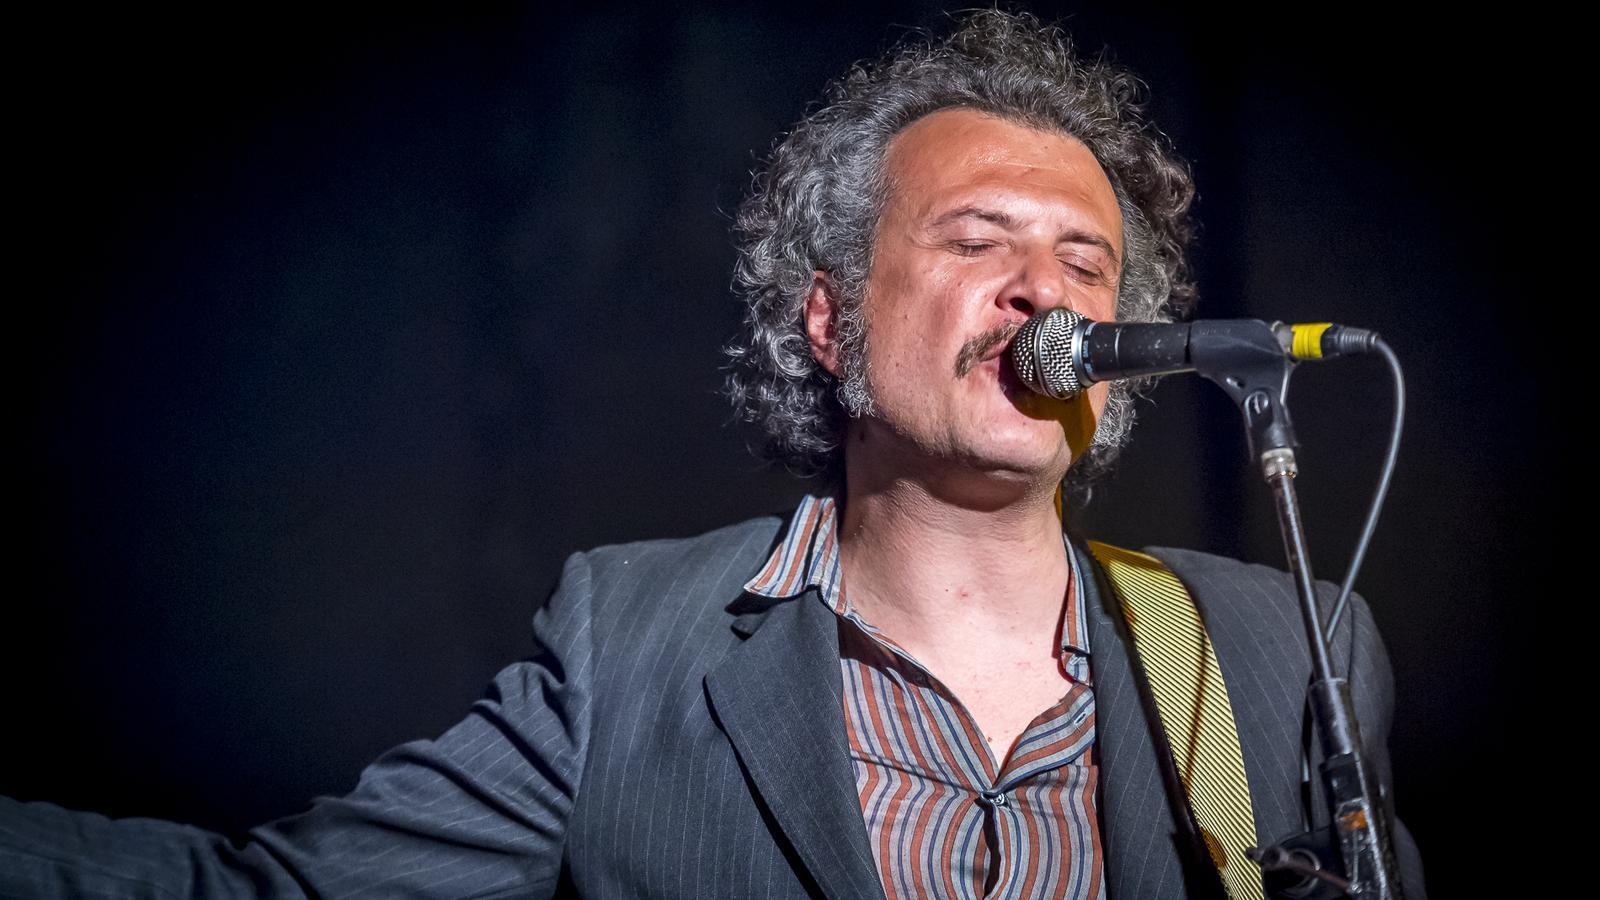 El músic gironí Jose Domingo